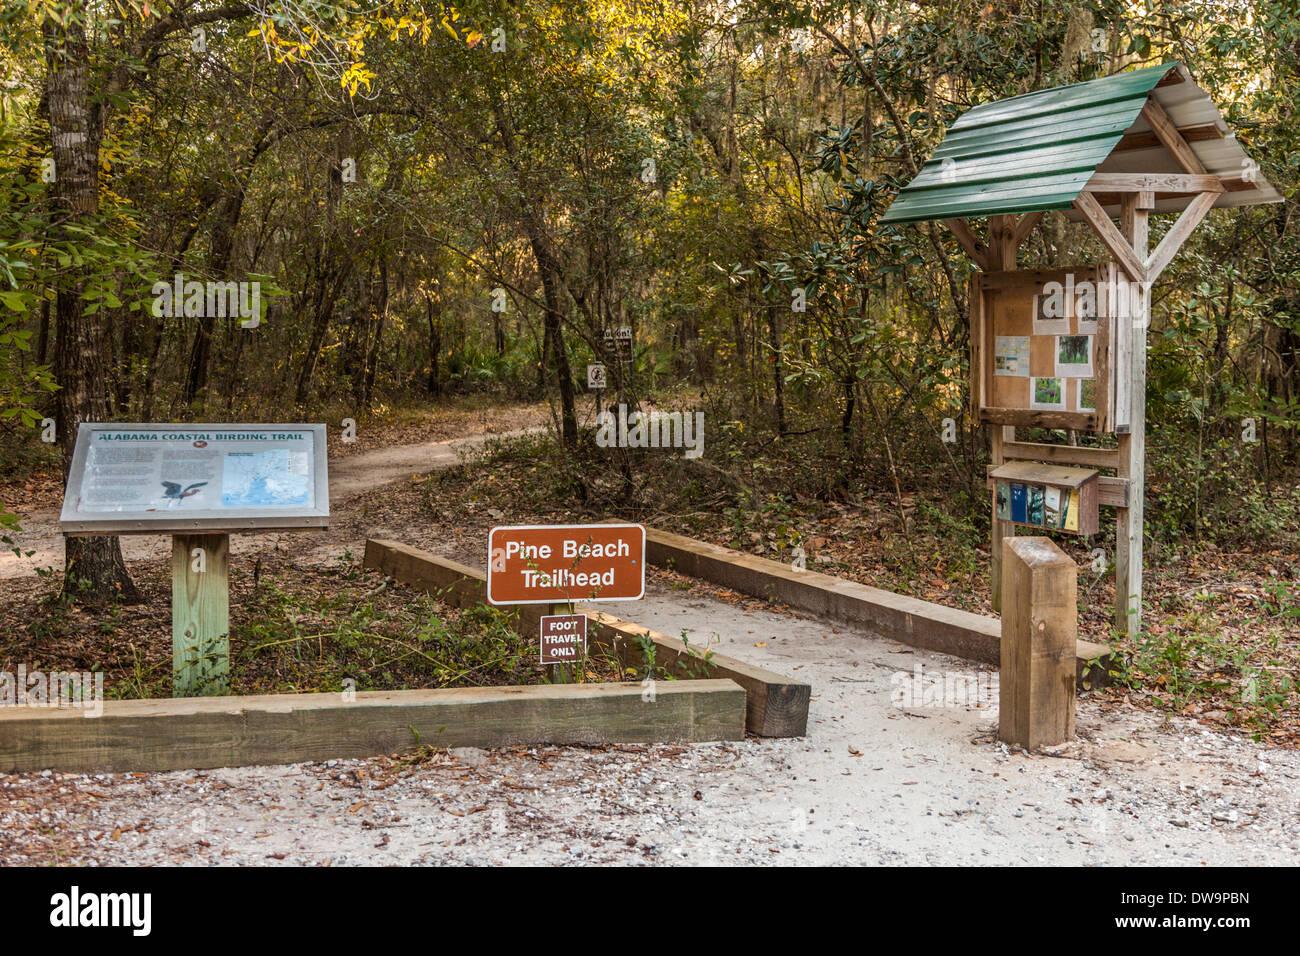 Pine Branch Trailhead of the Alabama Coastal Birding Trail at Bon Secour National Wildlife Refuge in Gulf Shores, Alabama - Stock Image